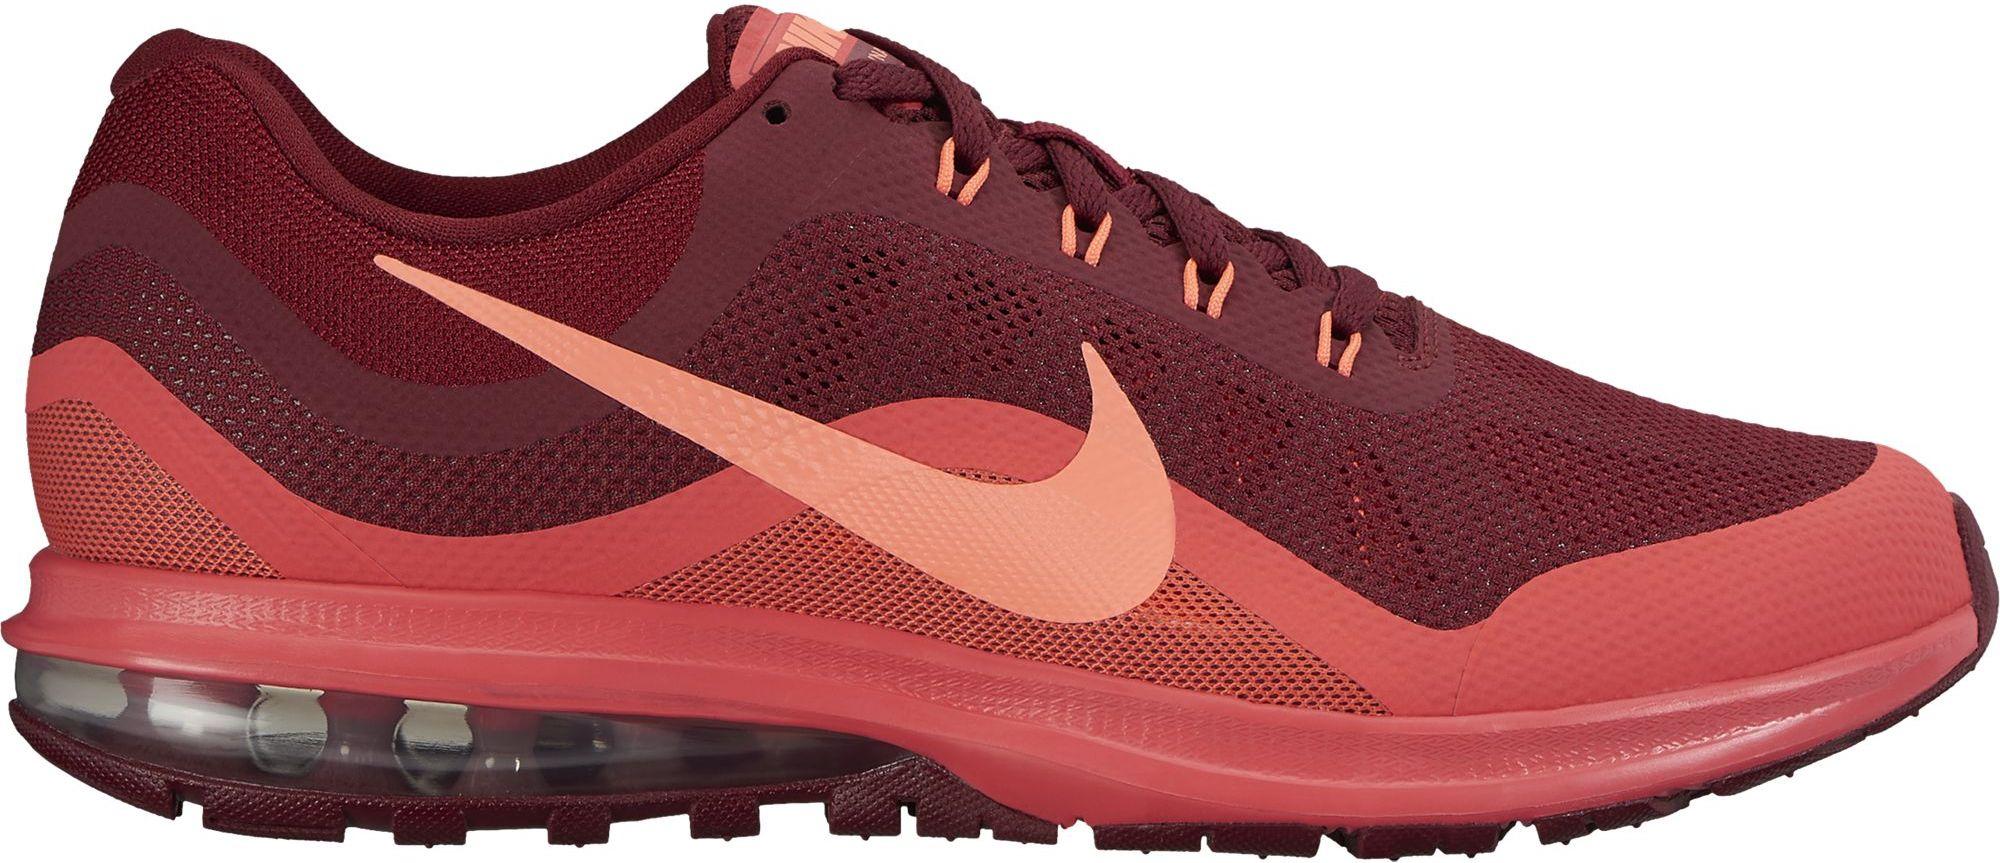 7ed6c3486f4 ... canada nike air max dynasty 2. mens leisure shoes 5f124 6a435